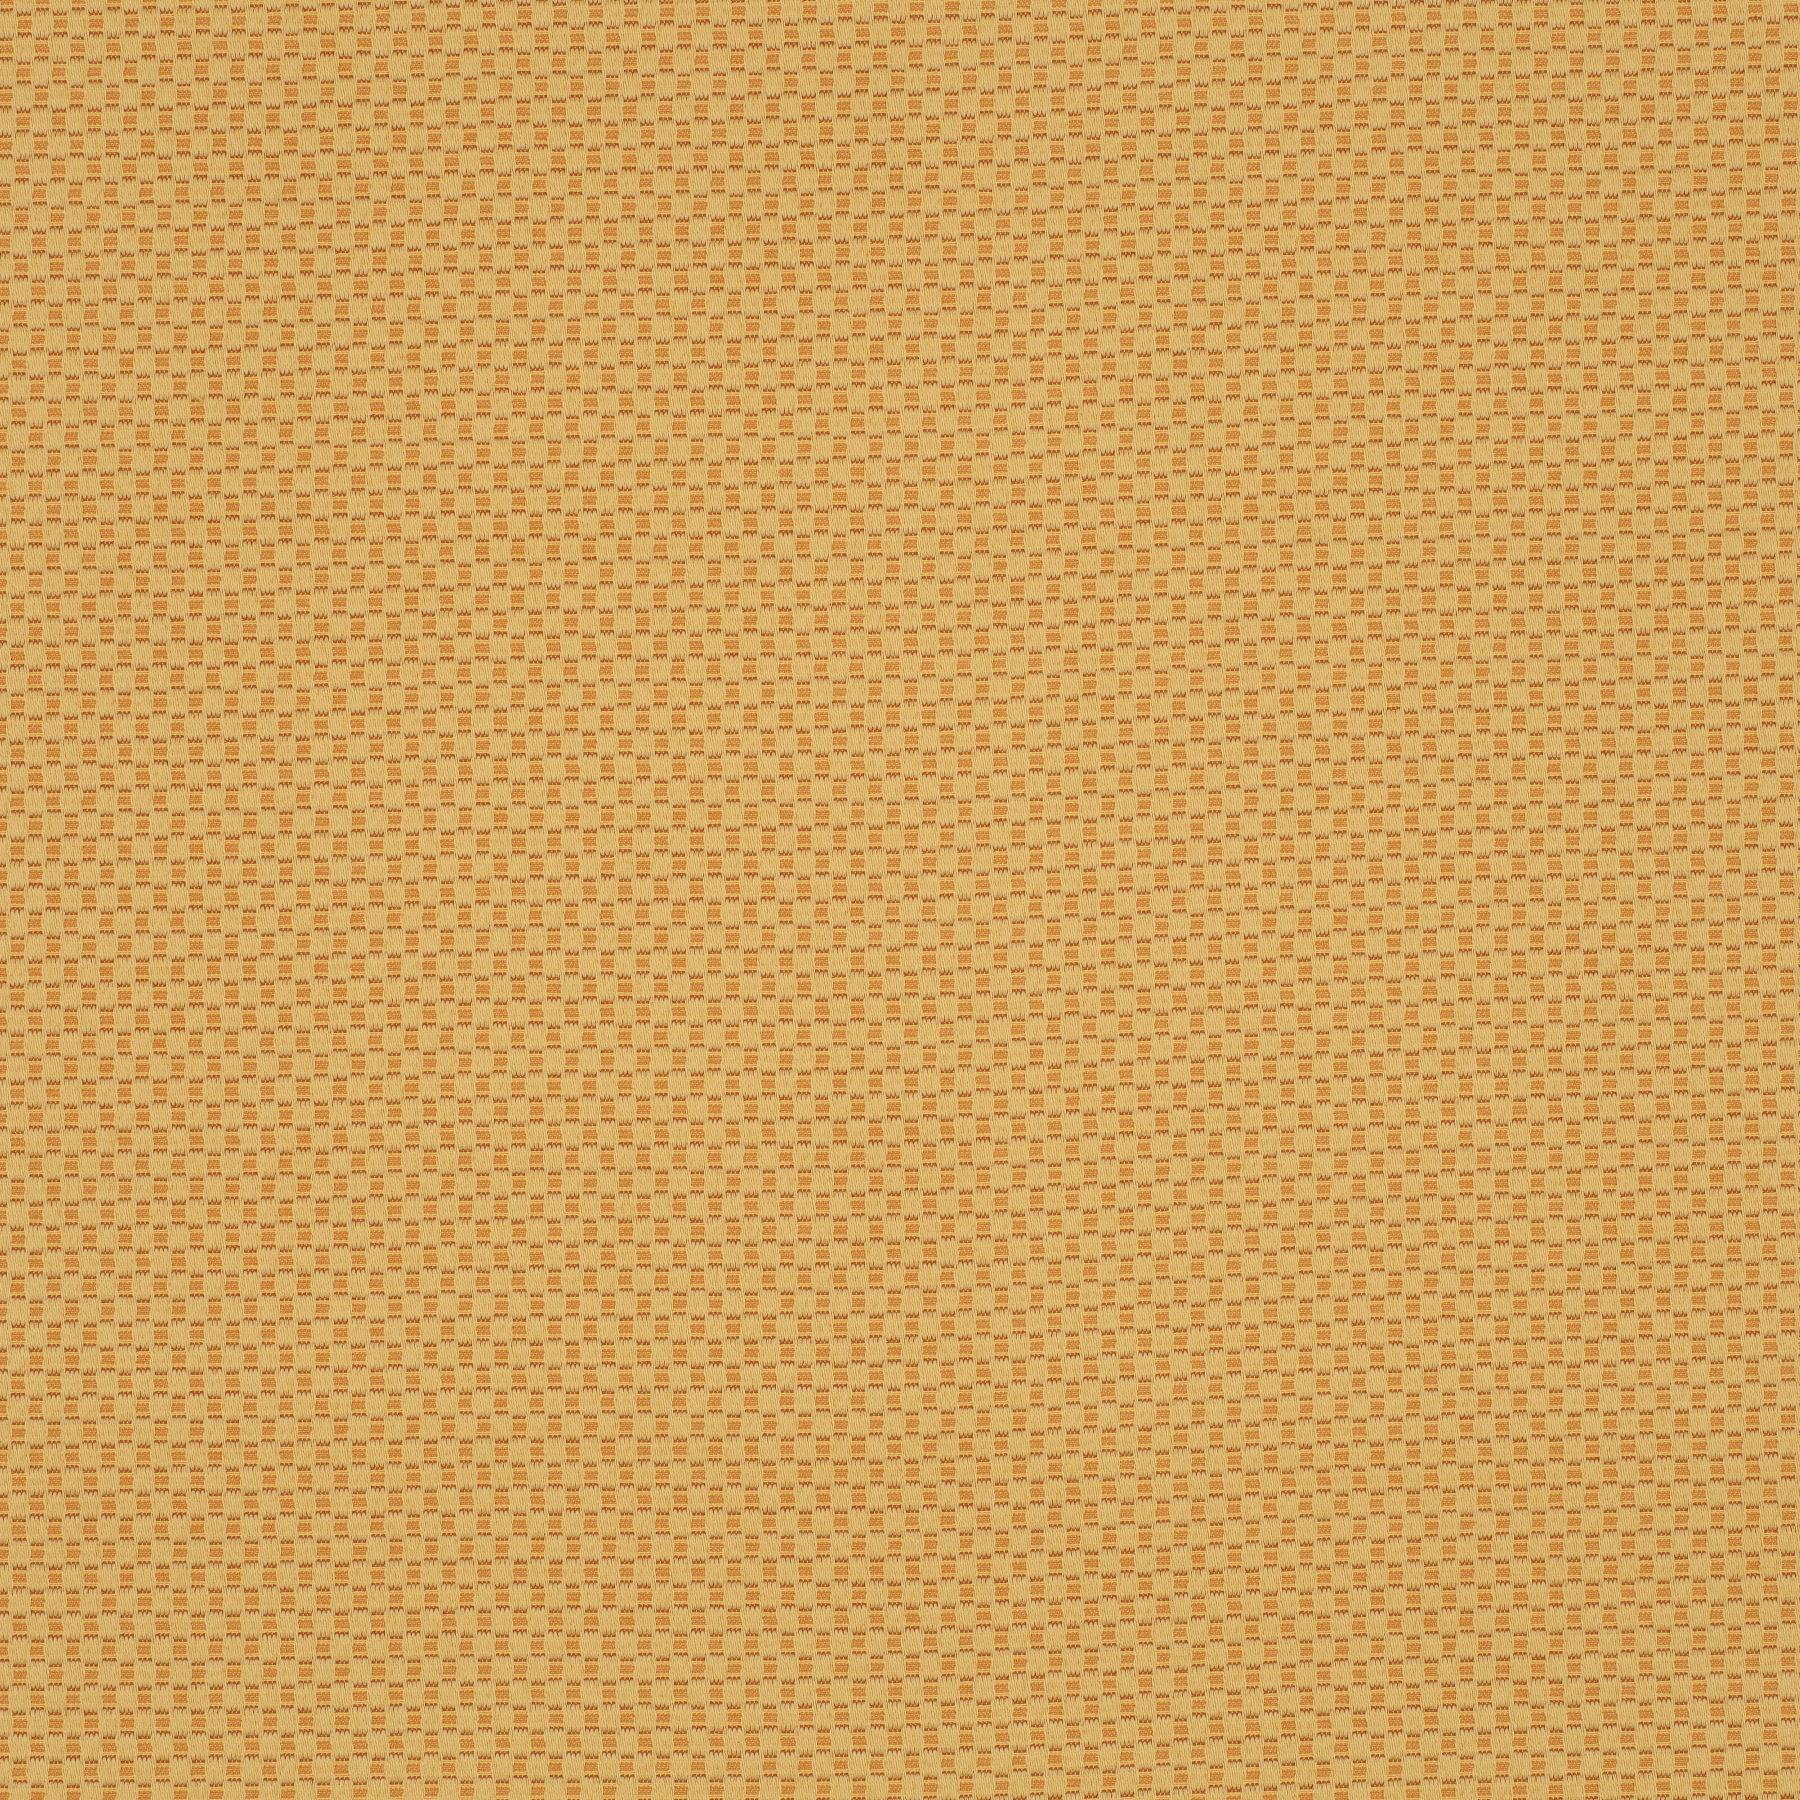 tissu de d coration lago 9 7538 061 jab anstoetz fabrics. Black Bedroom Furniture Sets. Home Design Ideas